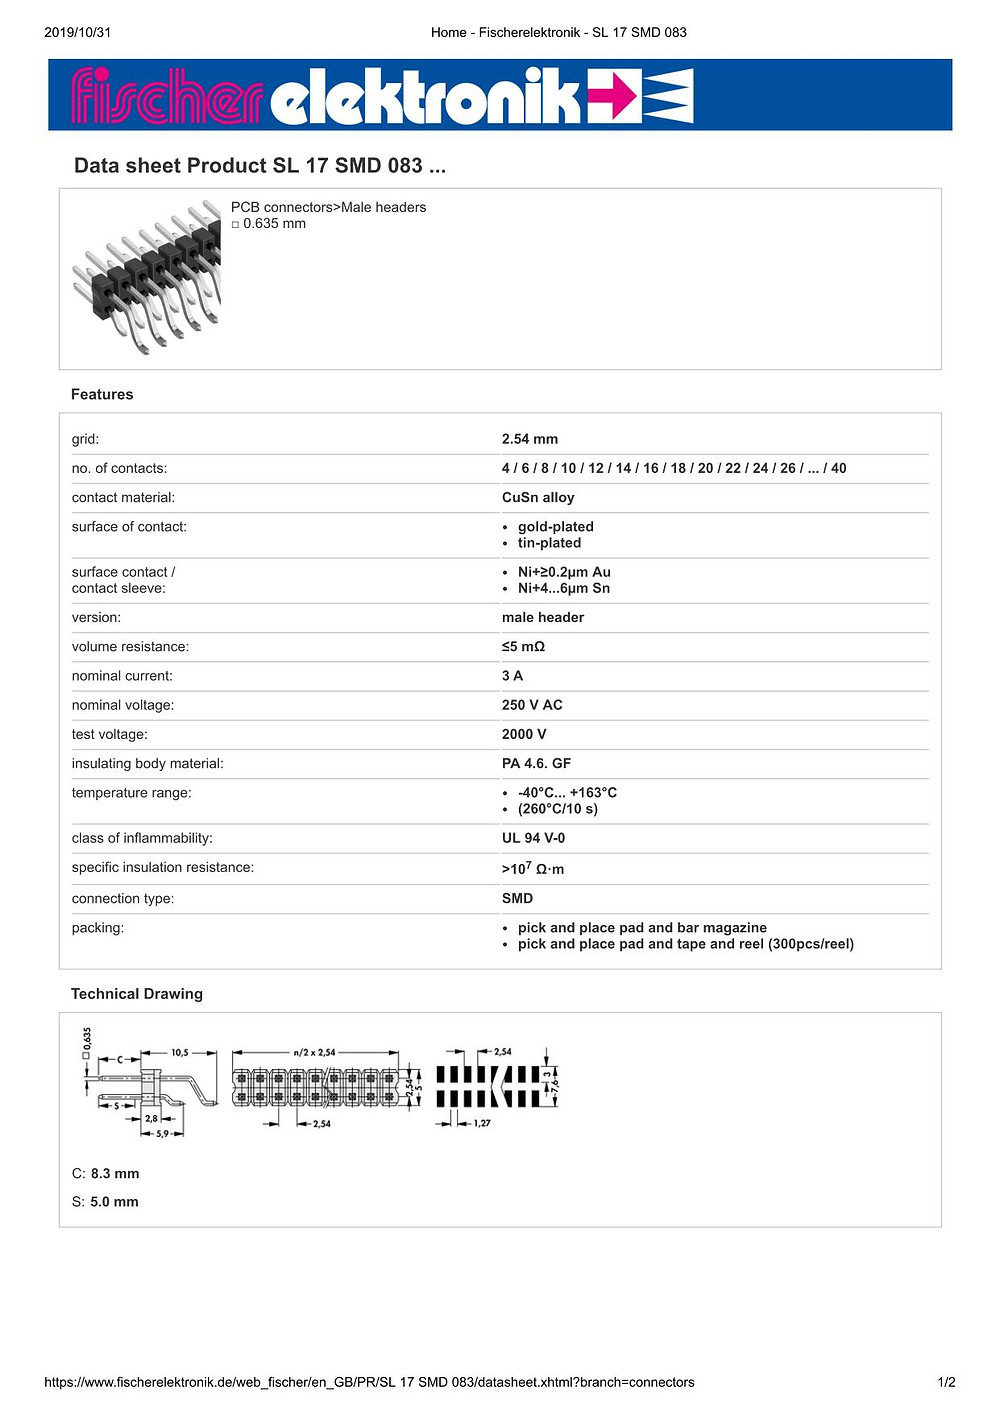 SL 17 SMD 083 フィッシャー テープ&リール対応 表面実装用ピンヘッダ ライトアングル2列 2.54㎜ピッチ □0.635mm 4-40ピン